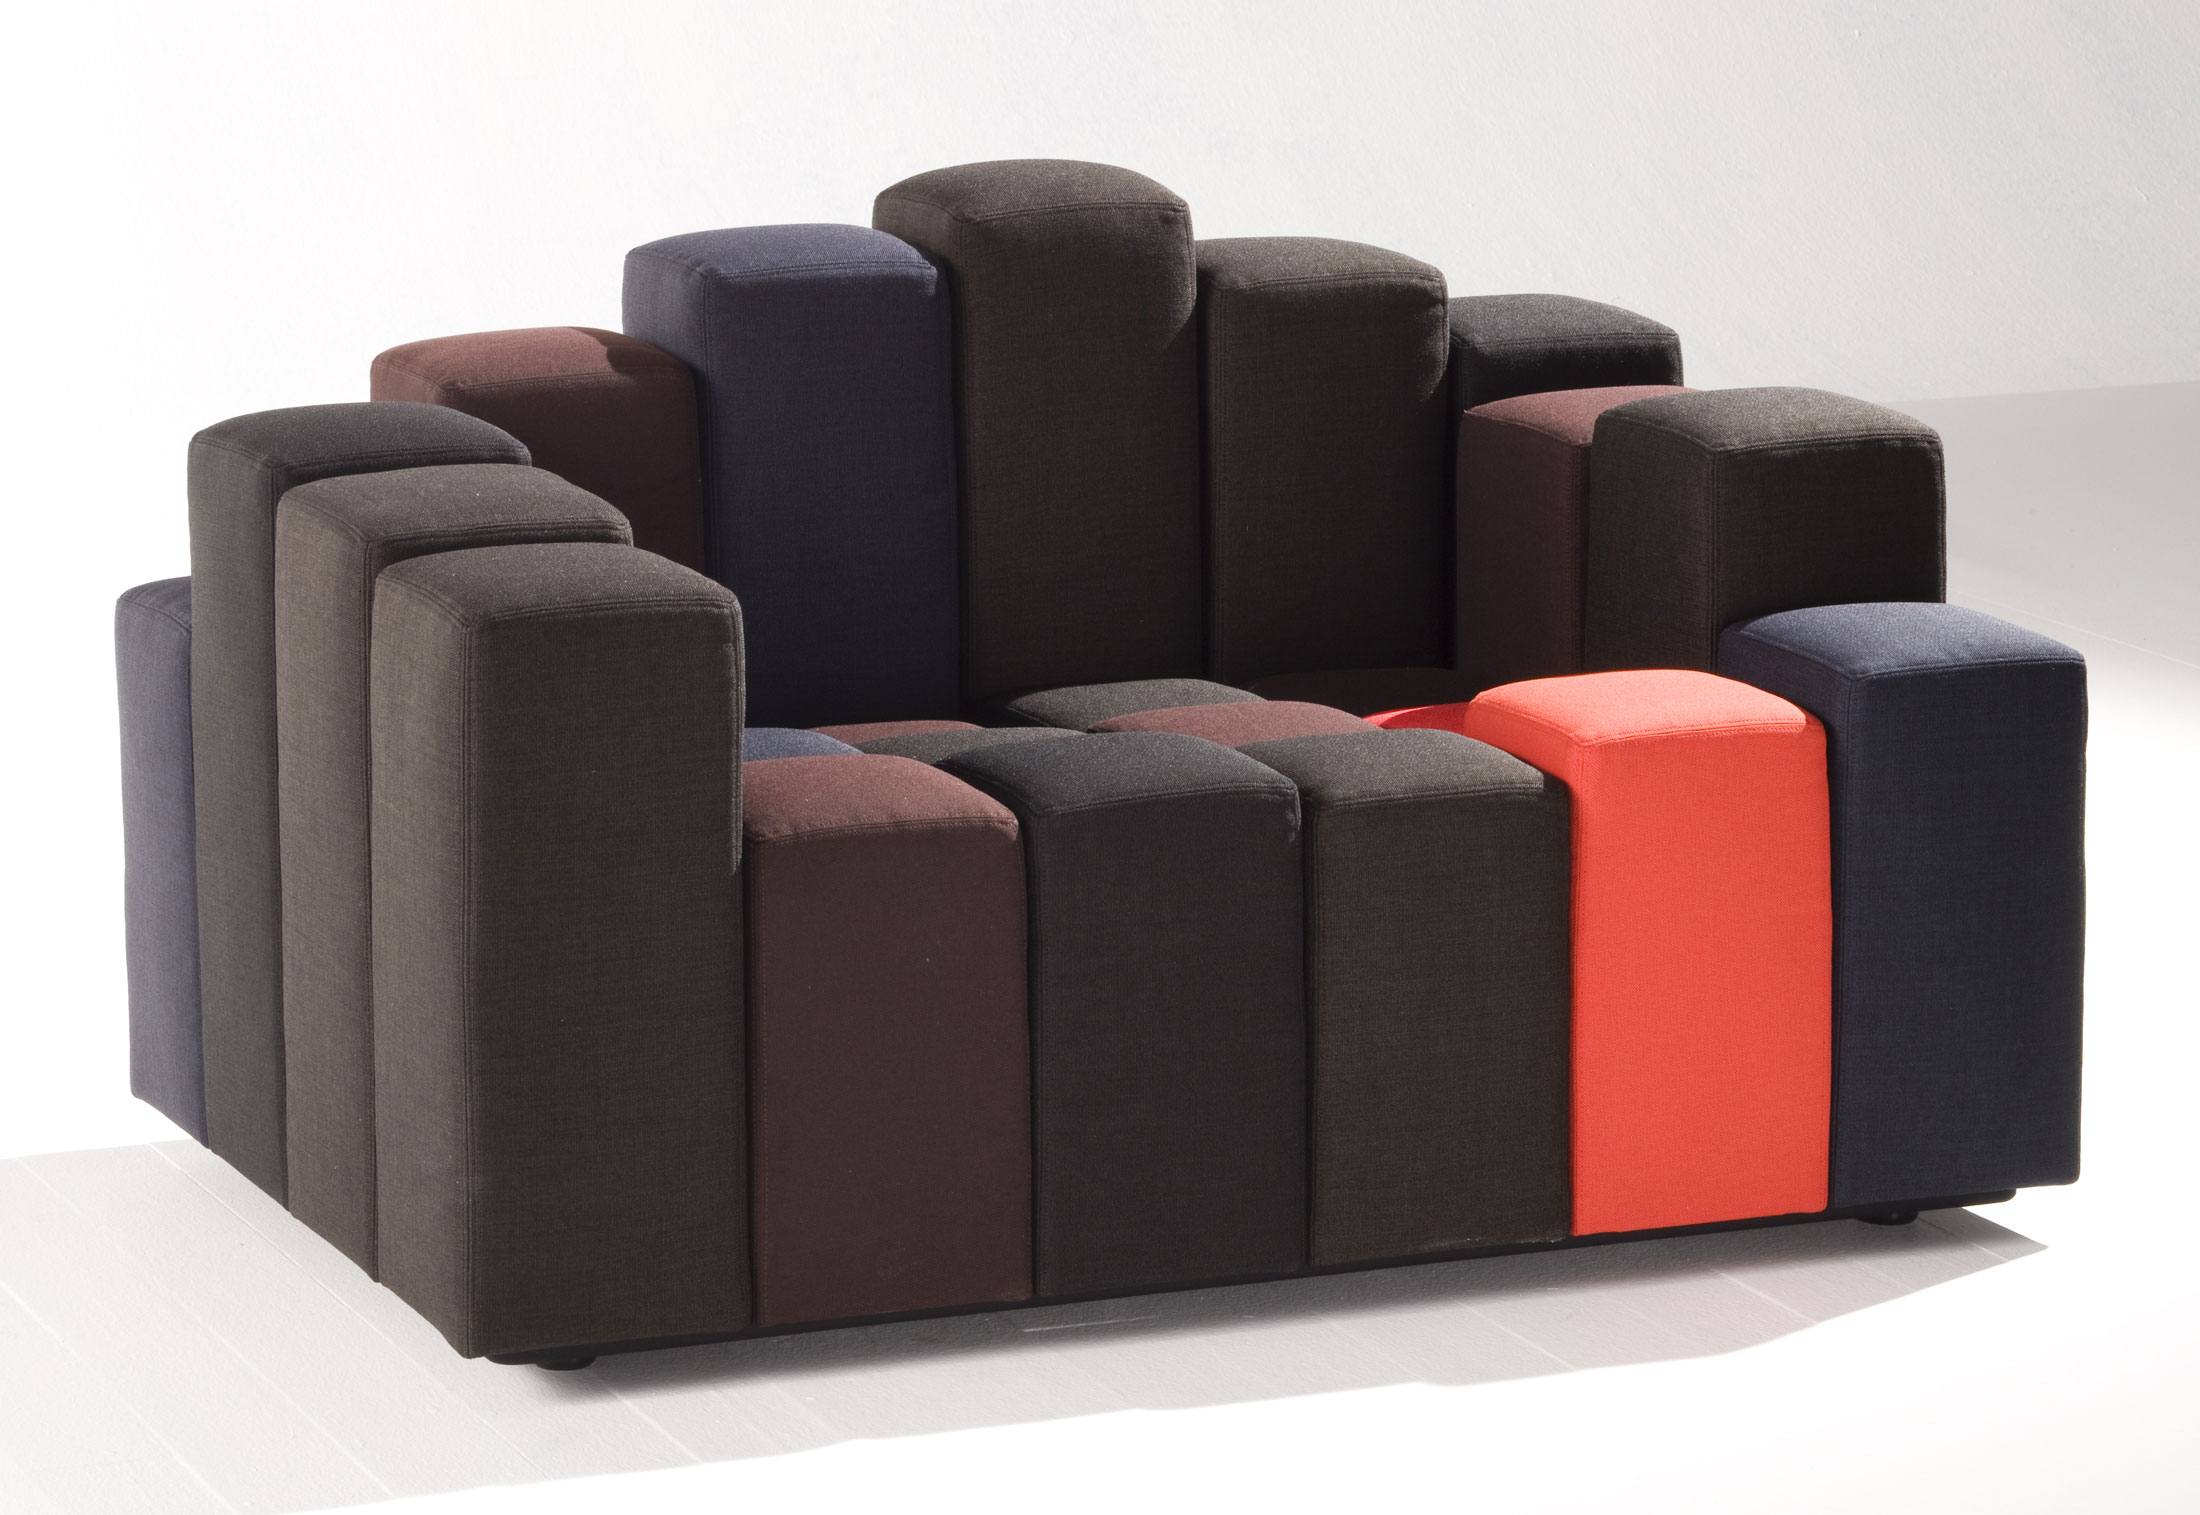 Amazing ... Do Lo Rez 2 Seater ... Design Ideas